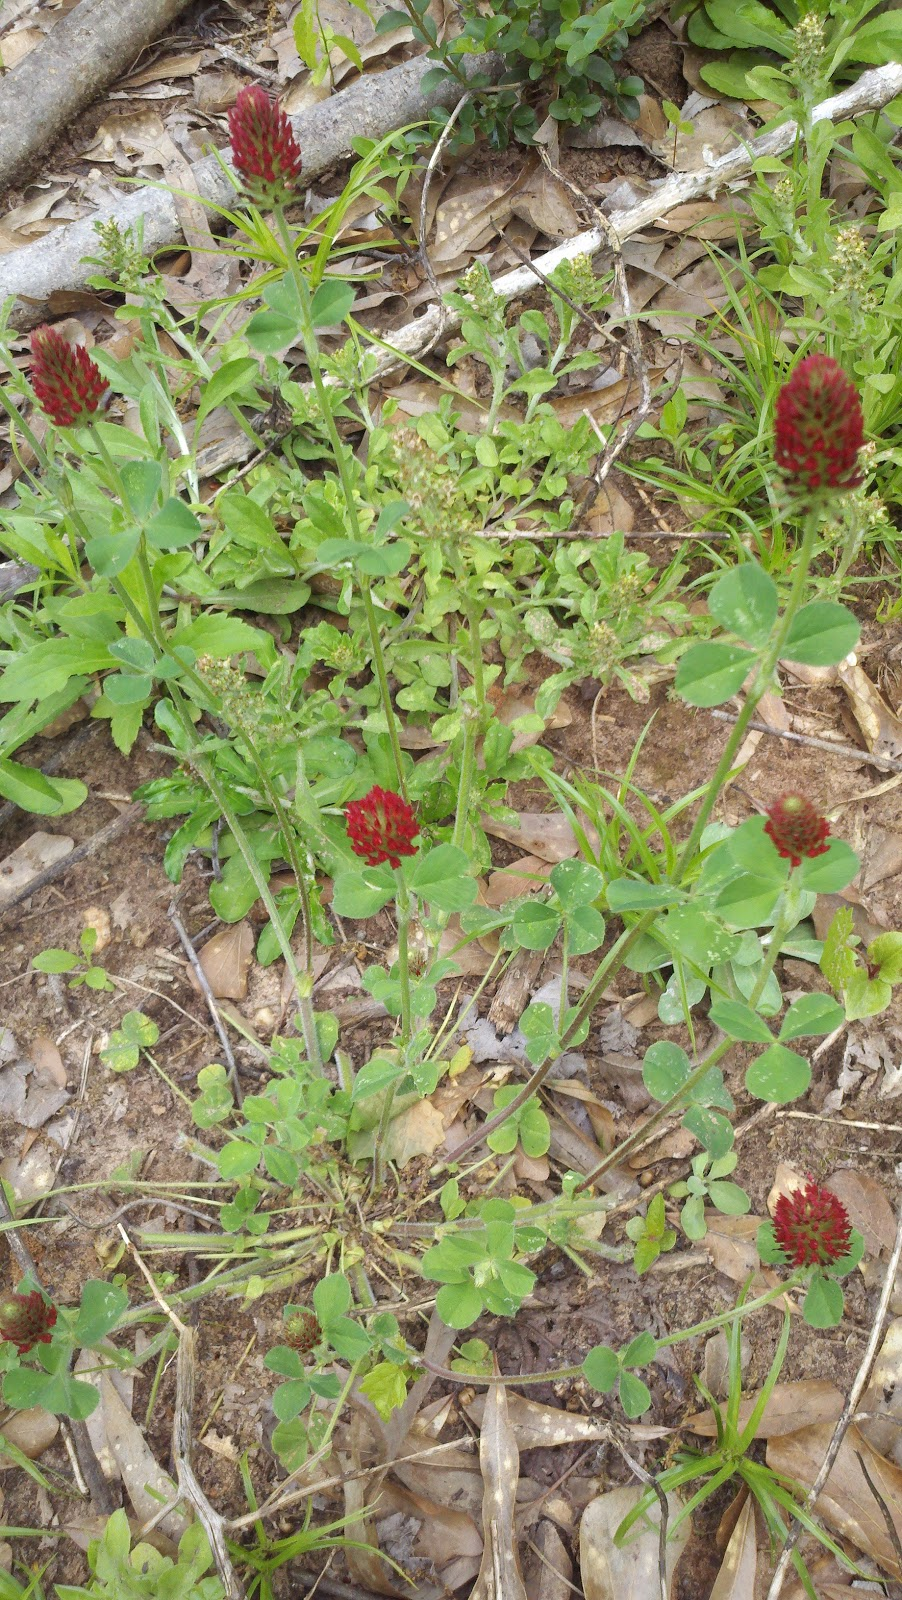 The Clover Beauty Inn Notd Blue Glitter Leopard Print: The Dewberry Blog: CLOVER, RED AND WHITE